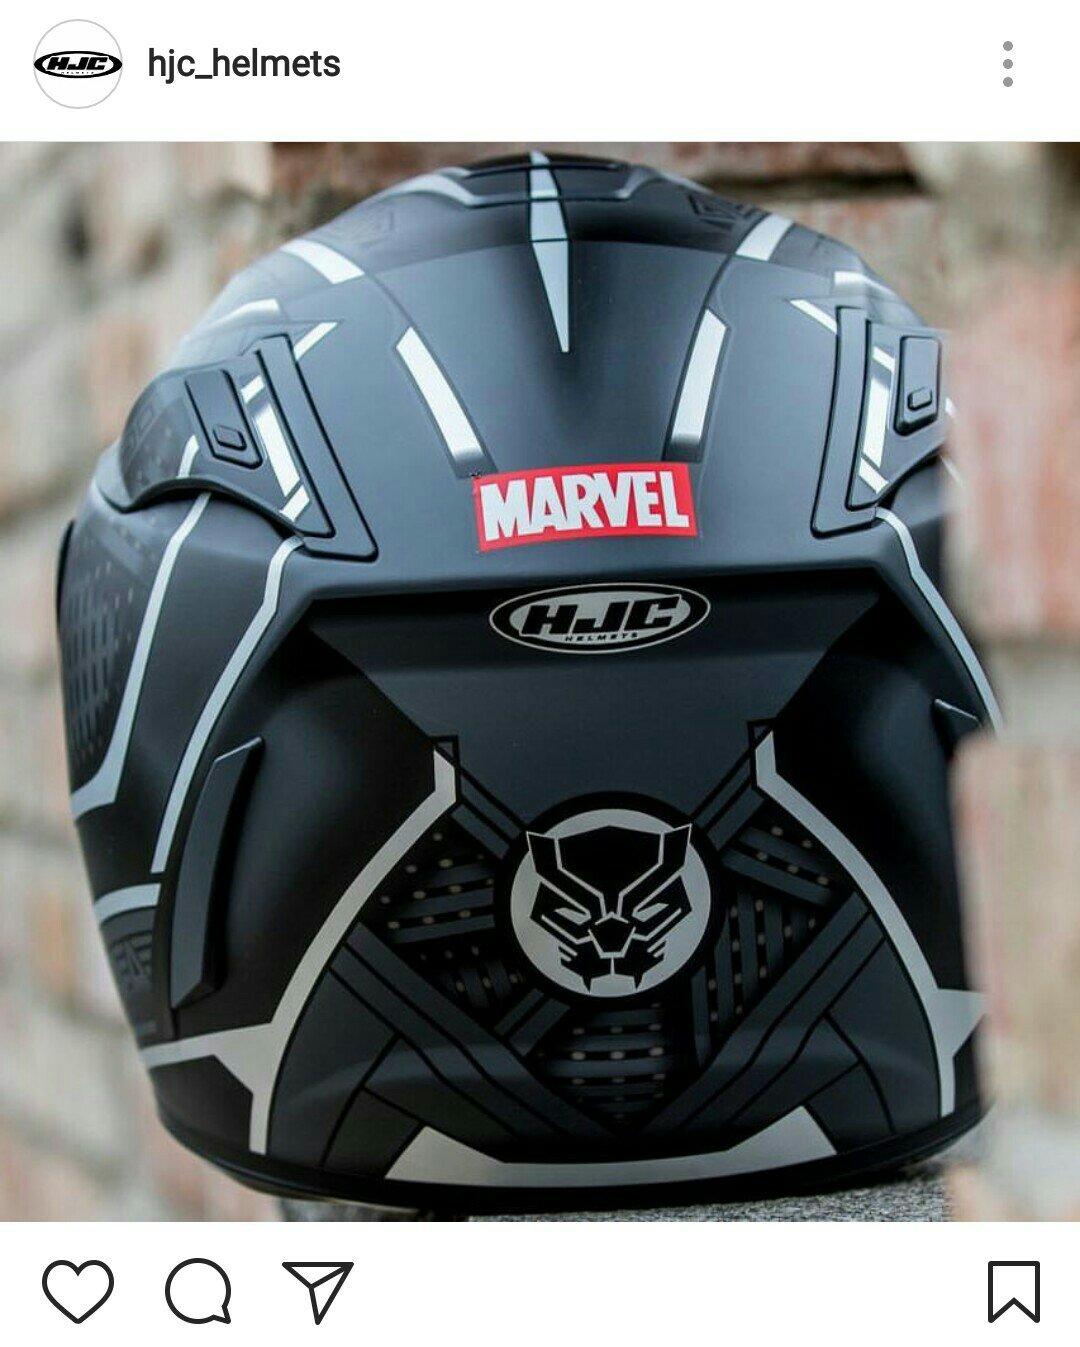 hjc helmets siap luncurkan helm dengan tema superhero. Black Bedroom Furniture Sets. Home Design Ideas